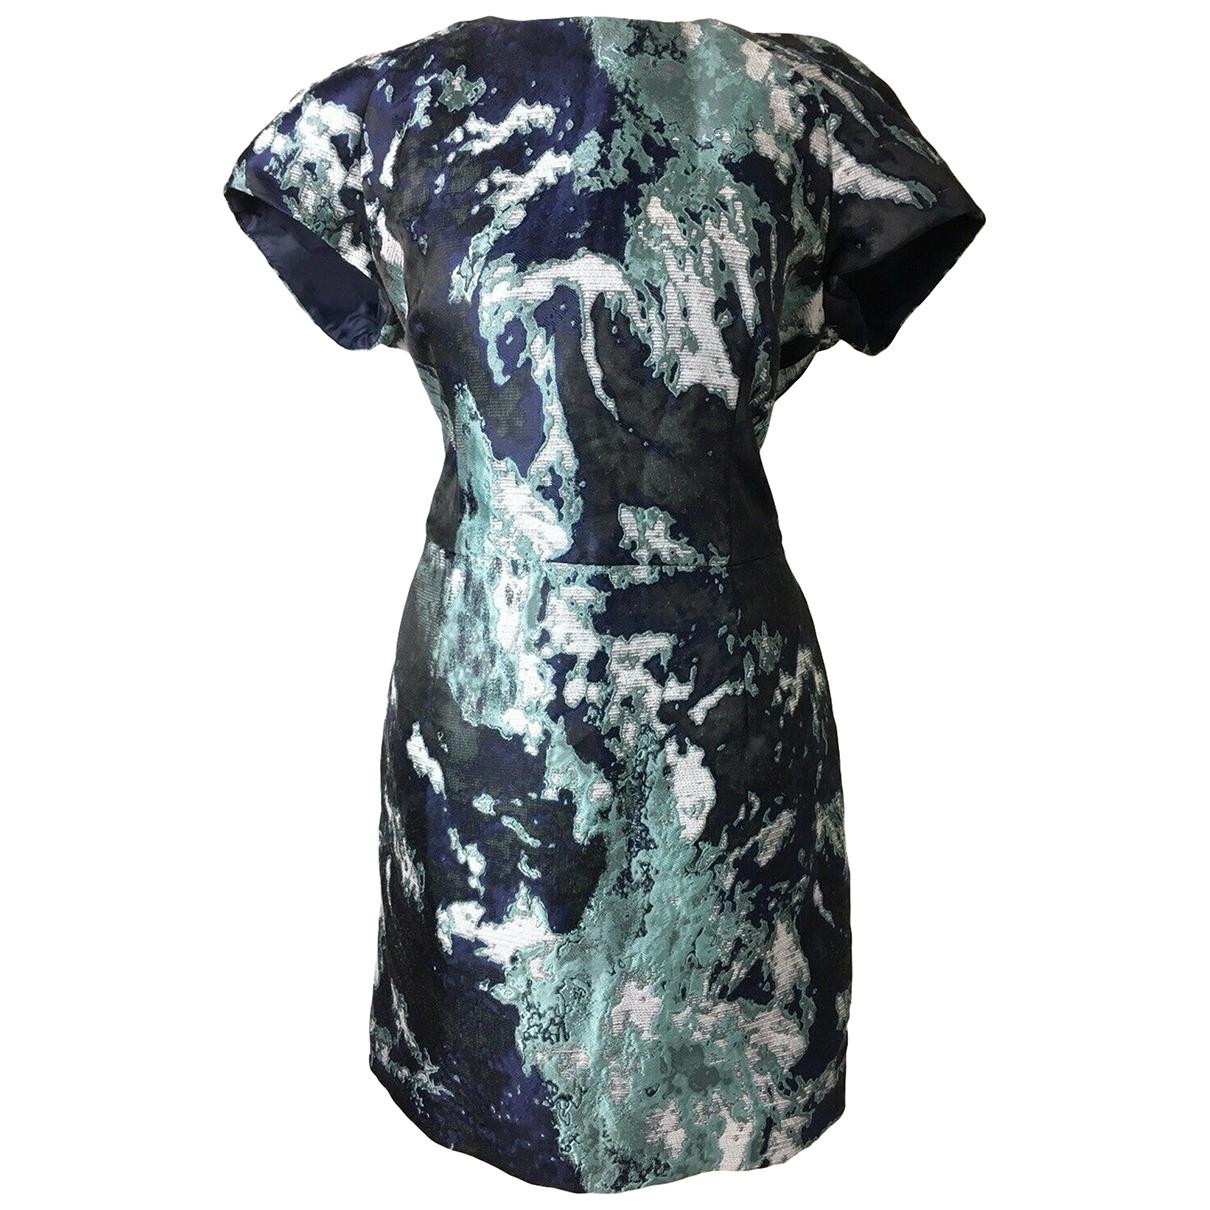 Zara \N Metallic dress for Women L International